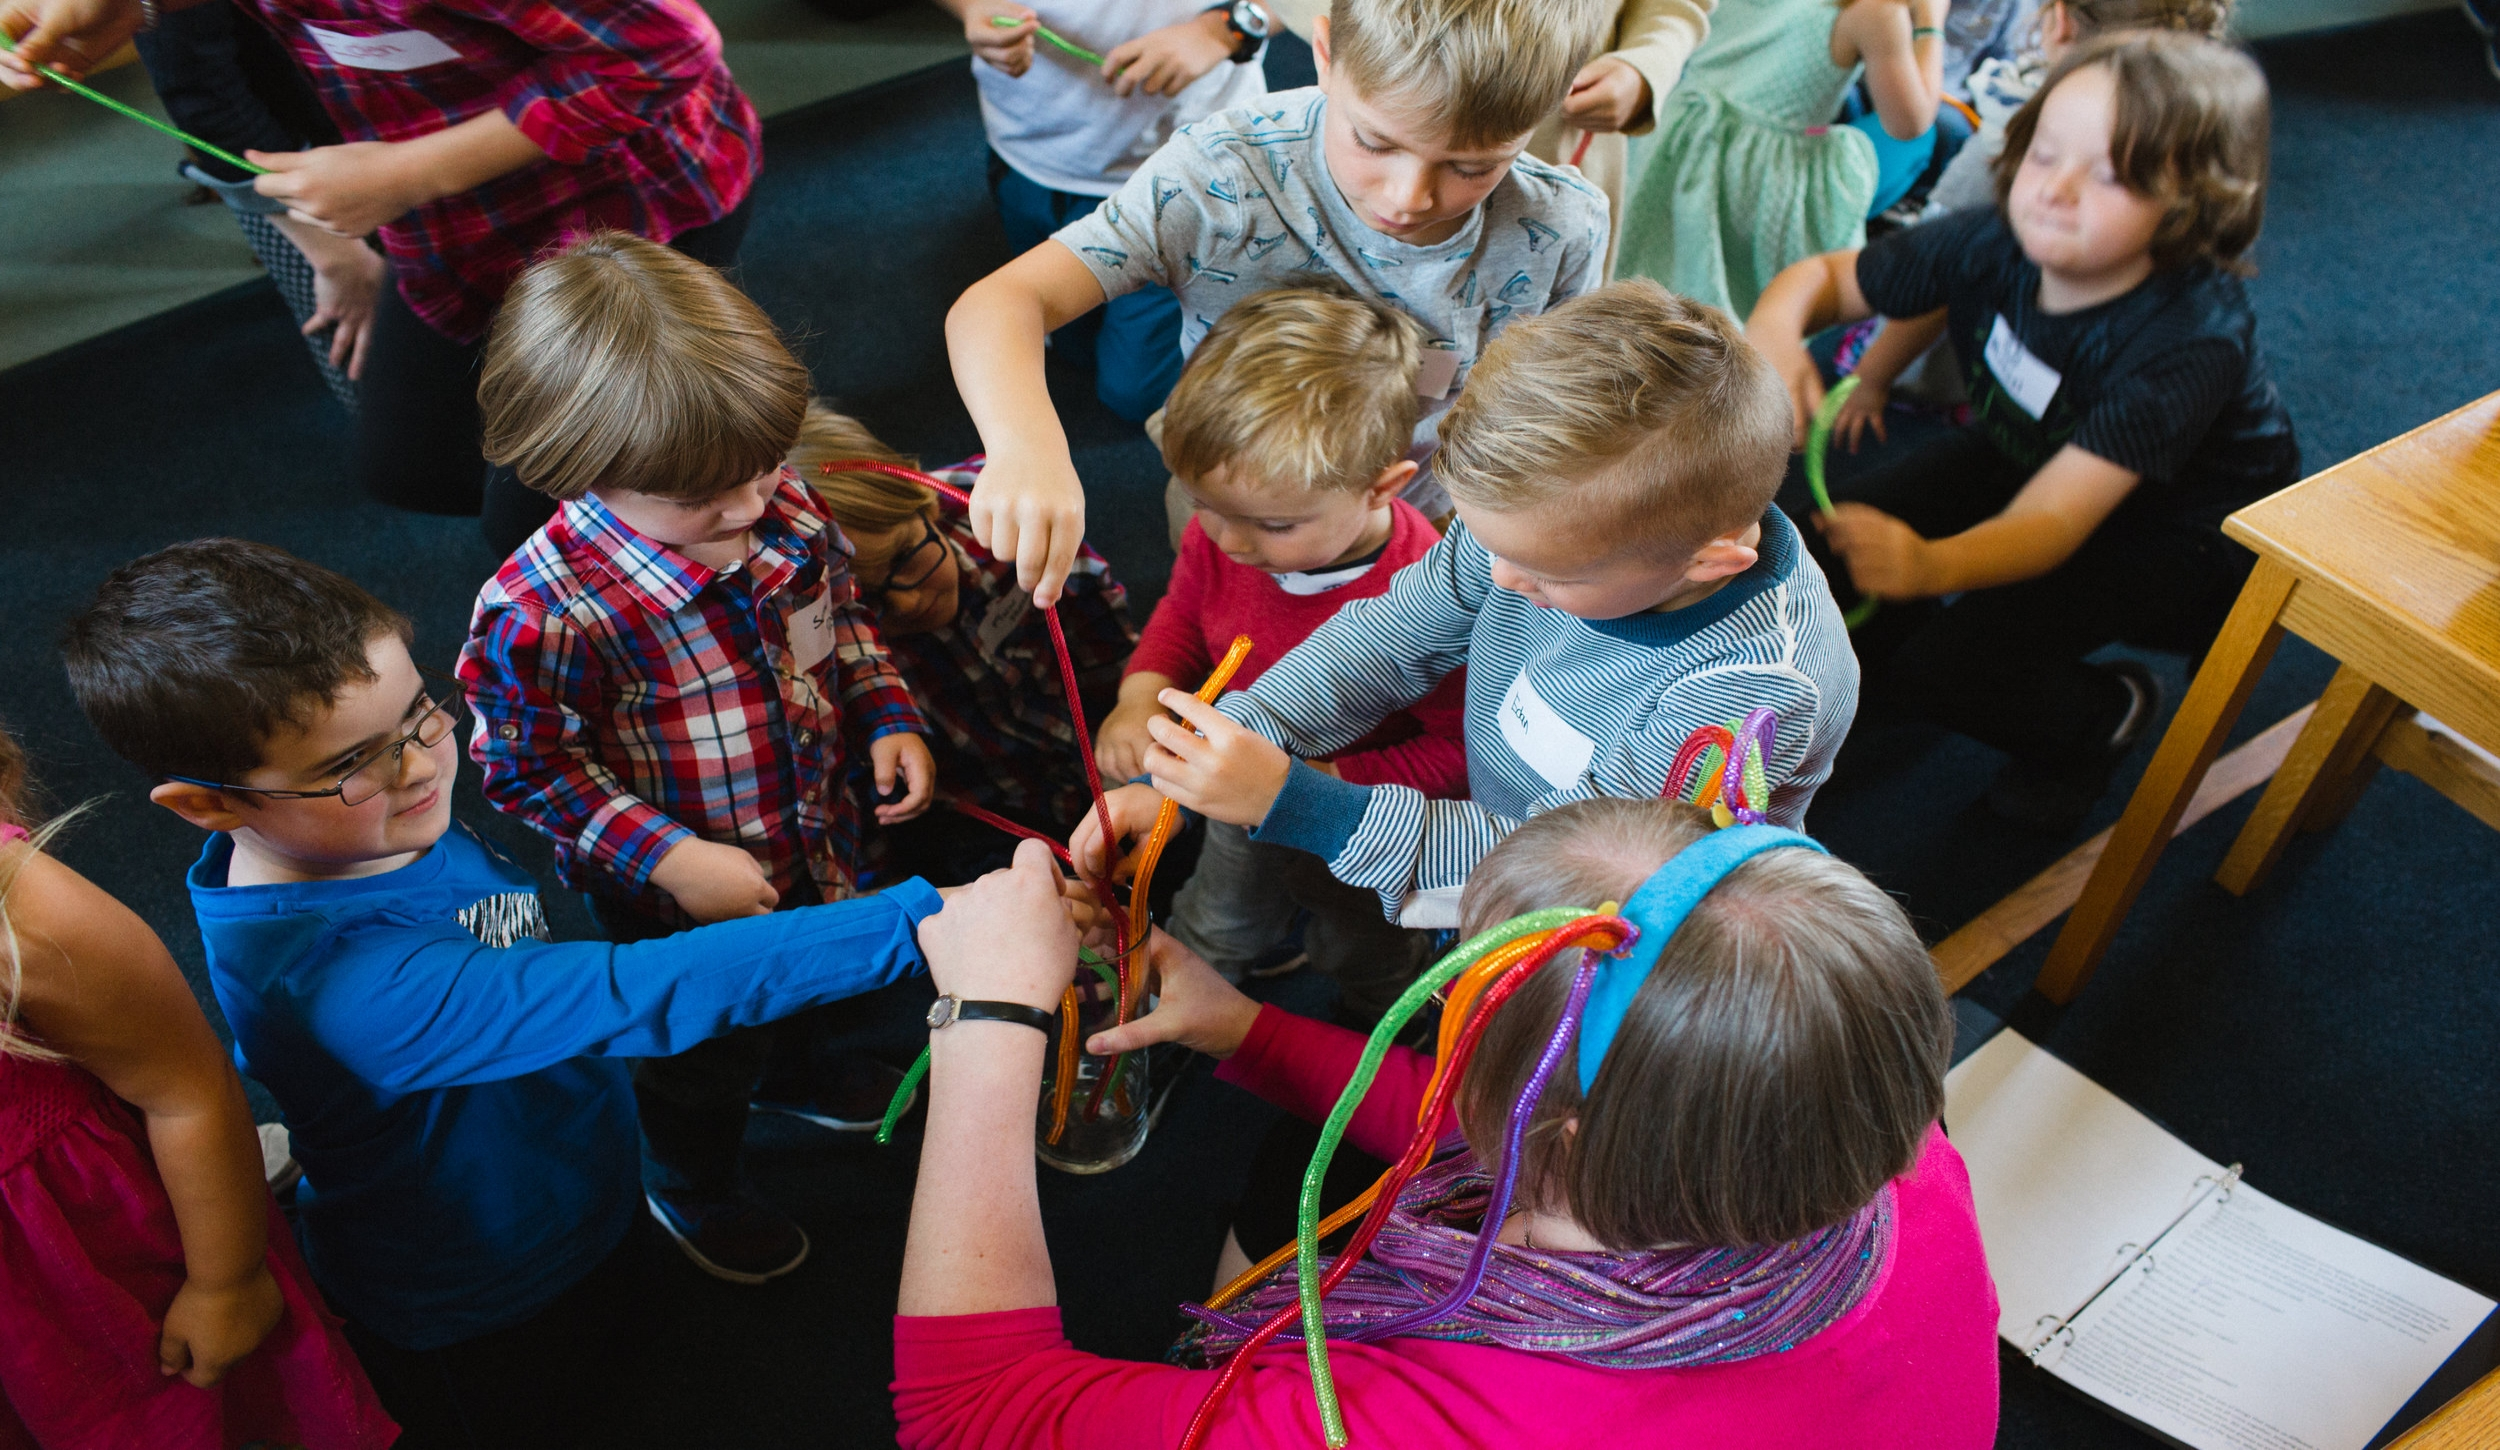 gatheringsunday2017-9childrenweaving.jpg